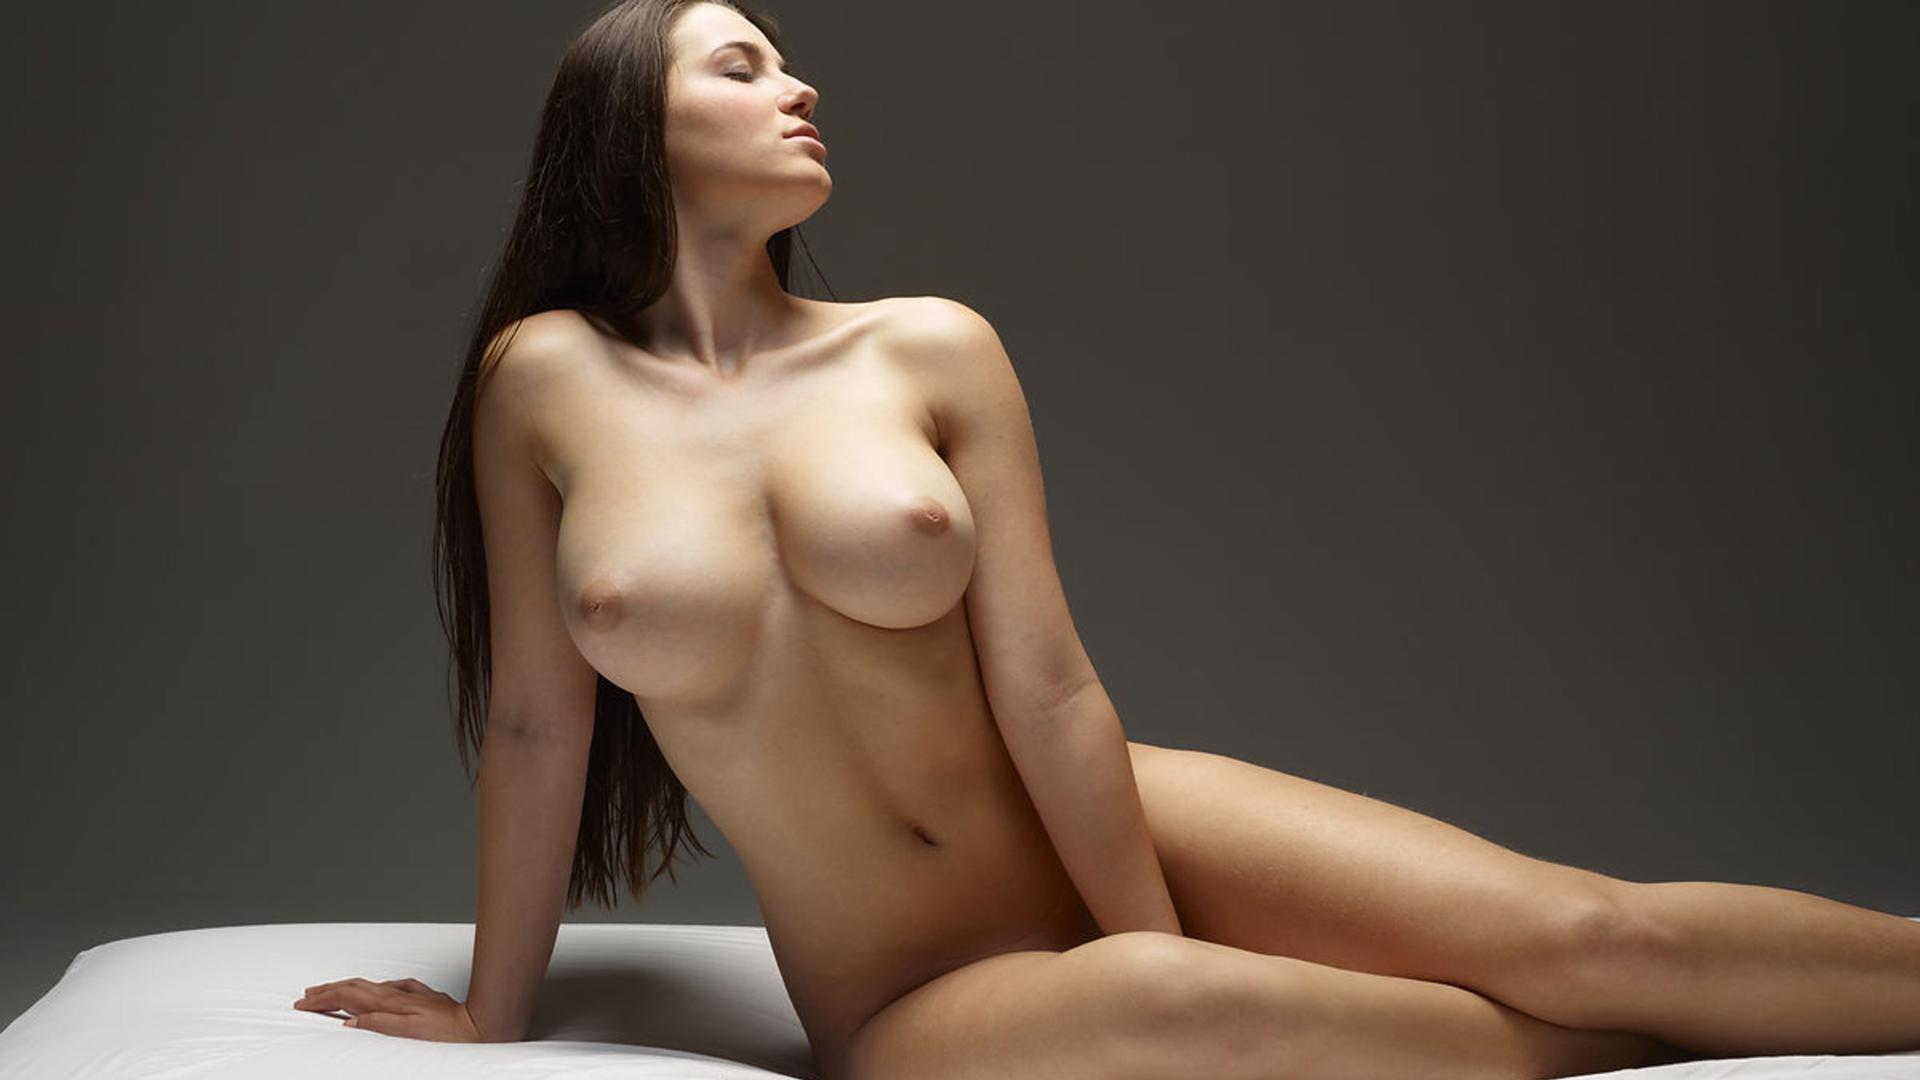 Video of big tits